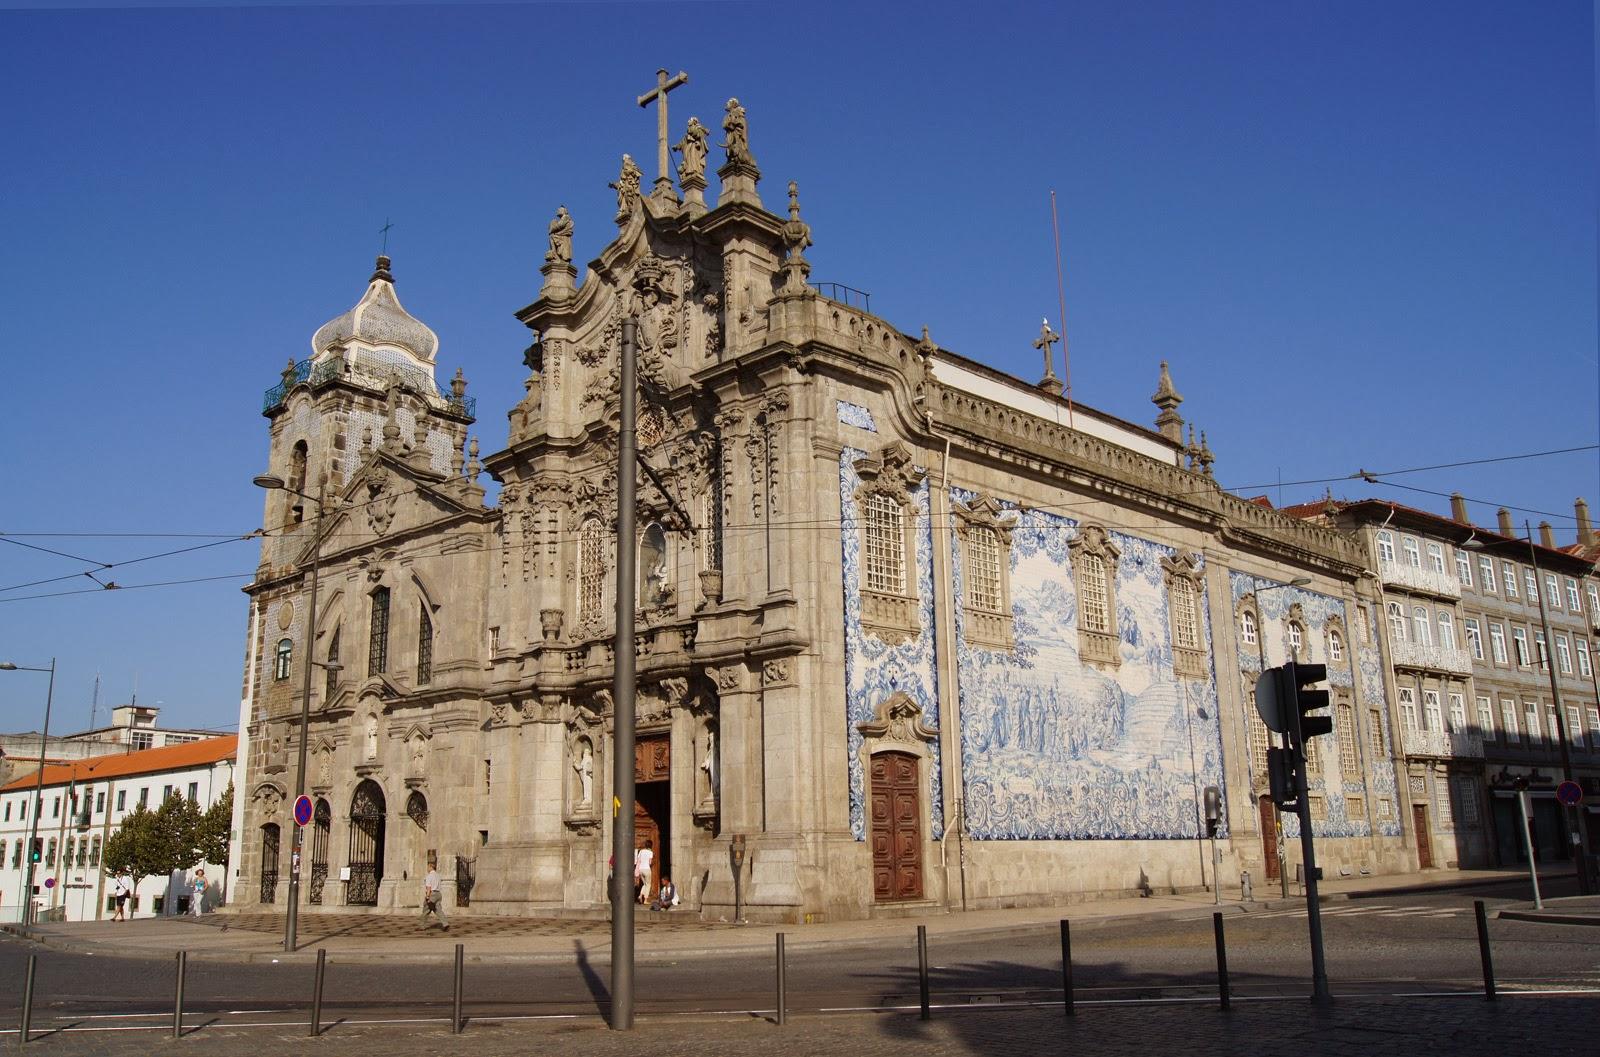 Pin to me mcdonald 39 s azulejos de portugal for Azulejos de portugal